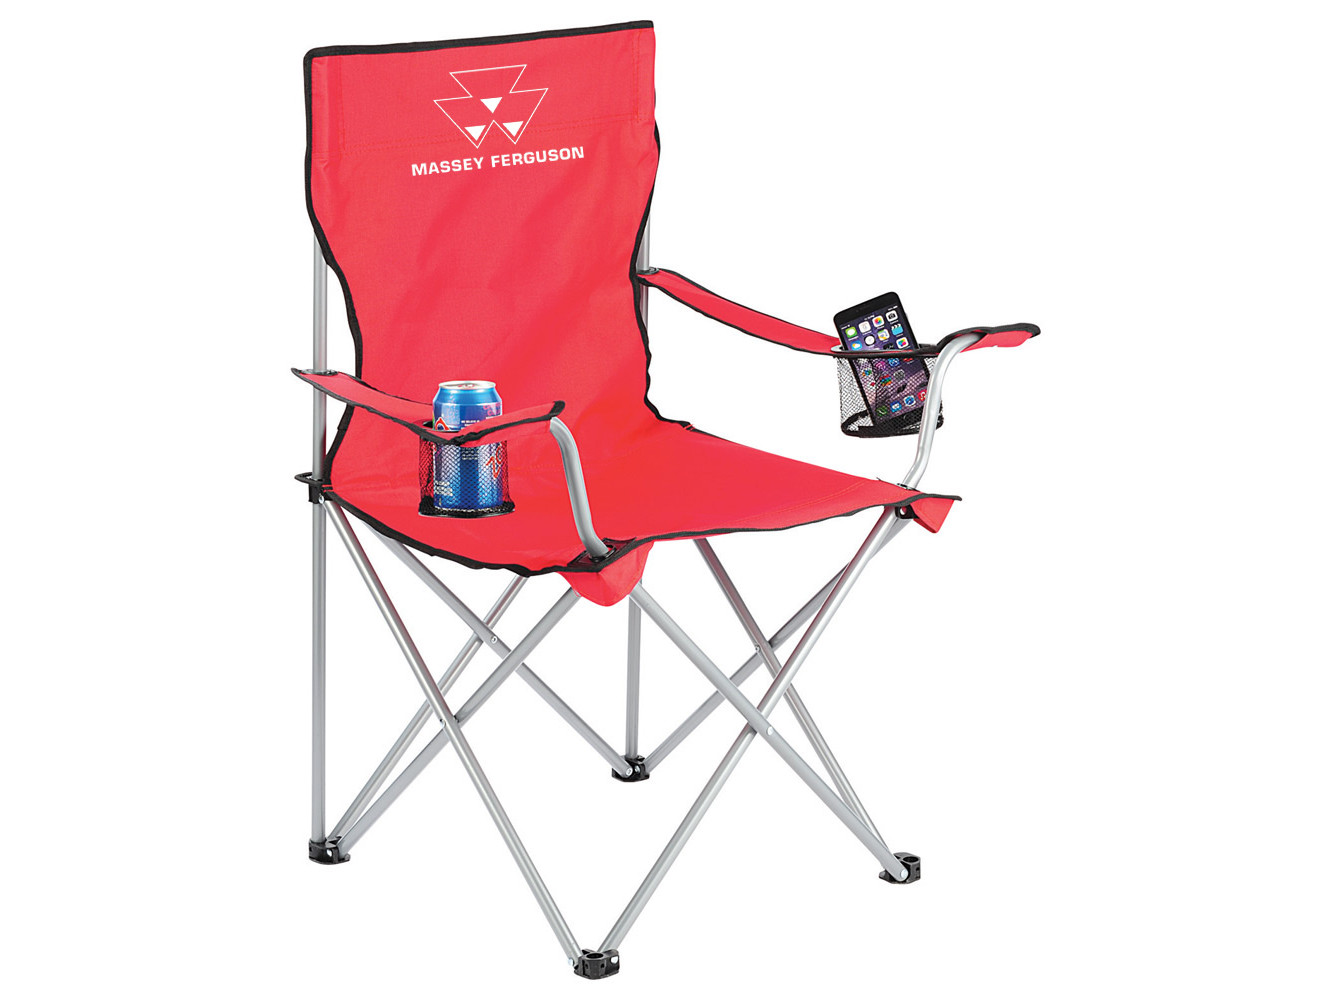 Massey Ferguson Lawn Chair